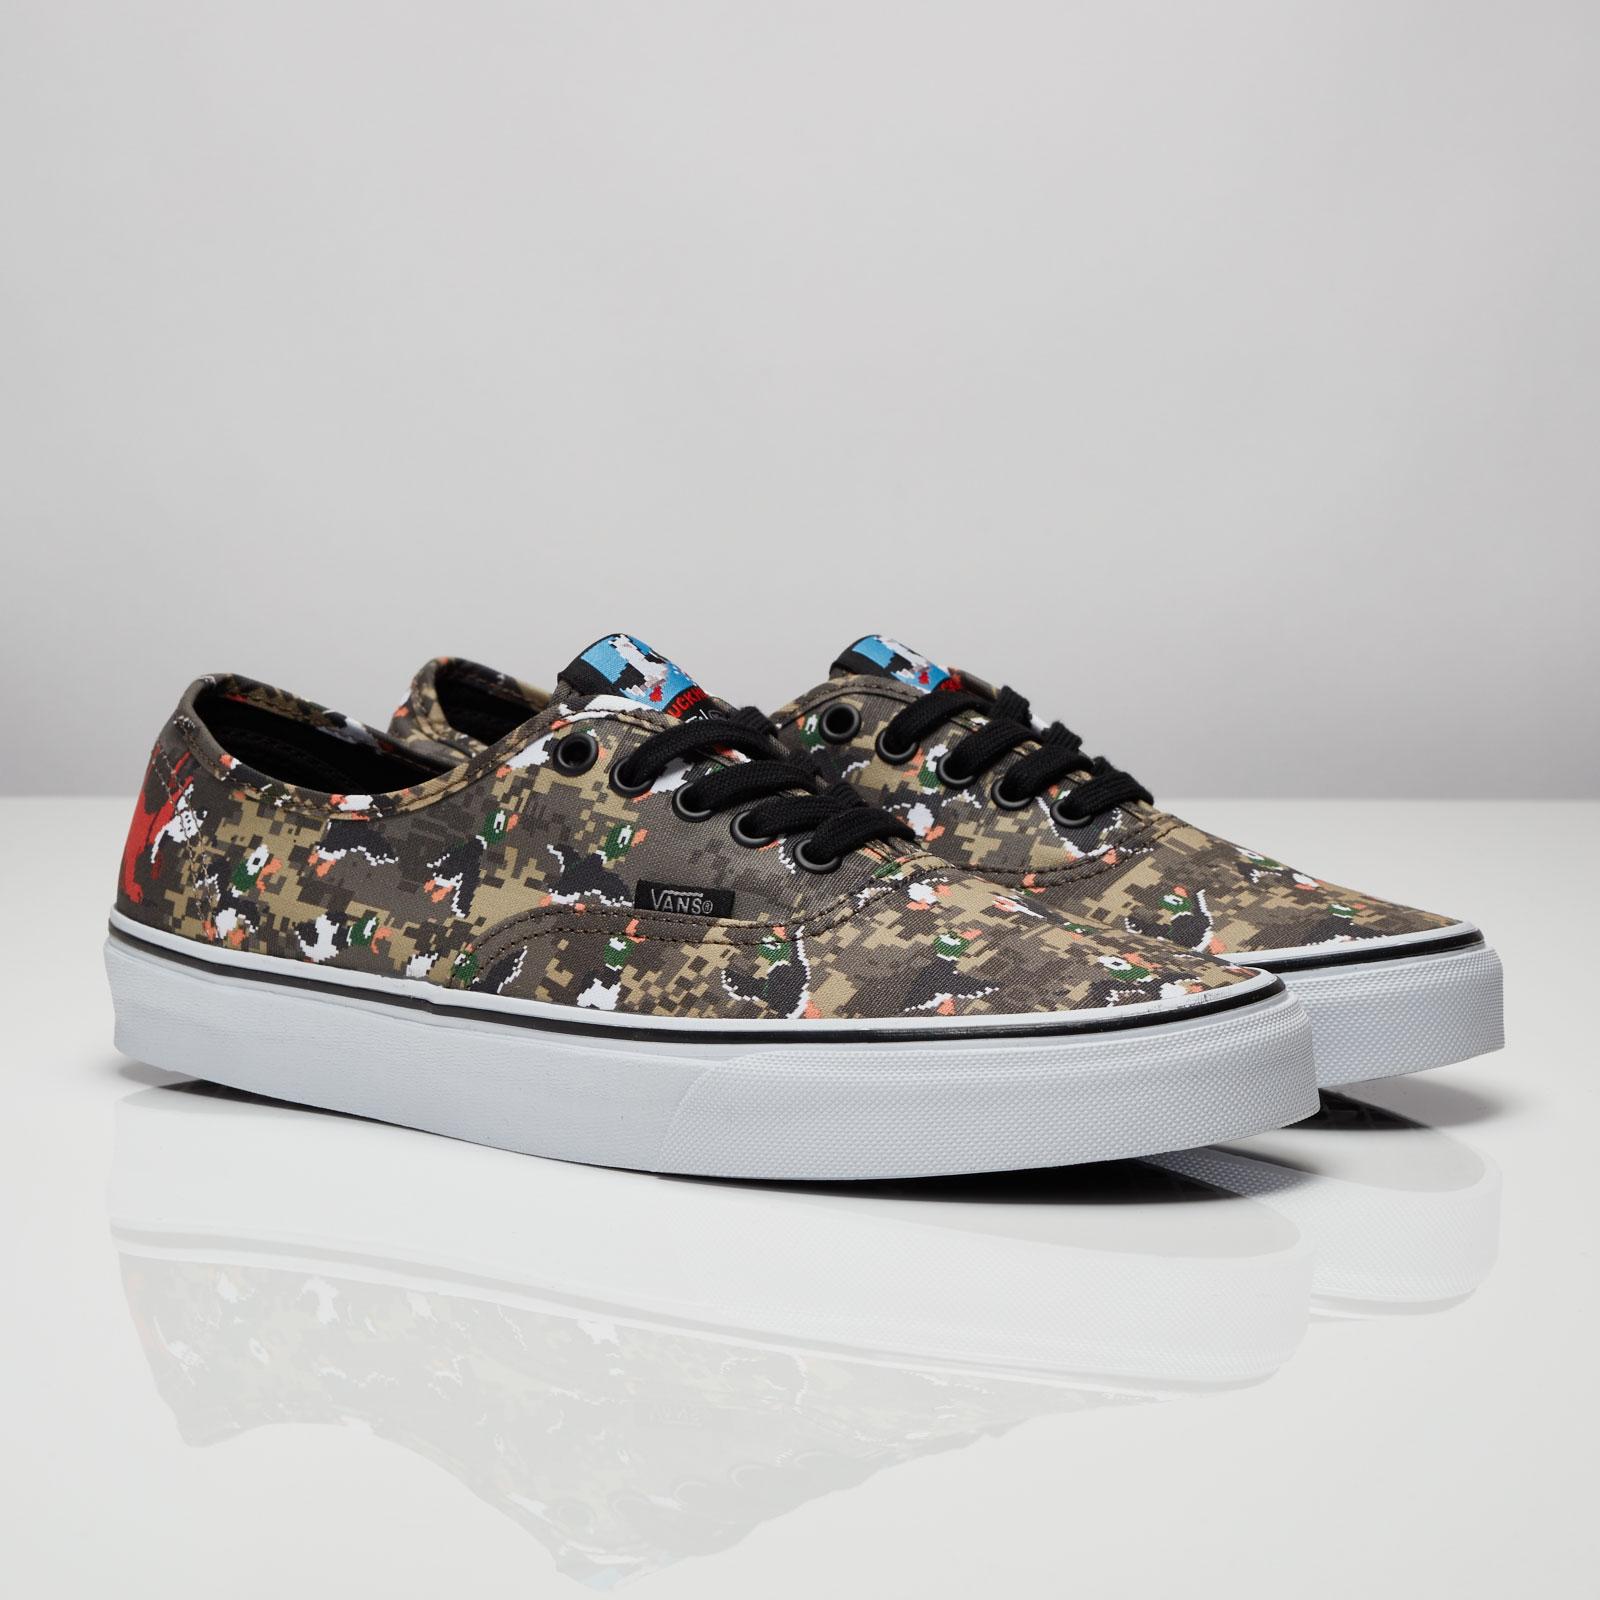 5b095492acb302 Vans Authentic - V4mljp7 - Sneakersnstuff